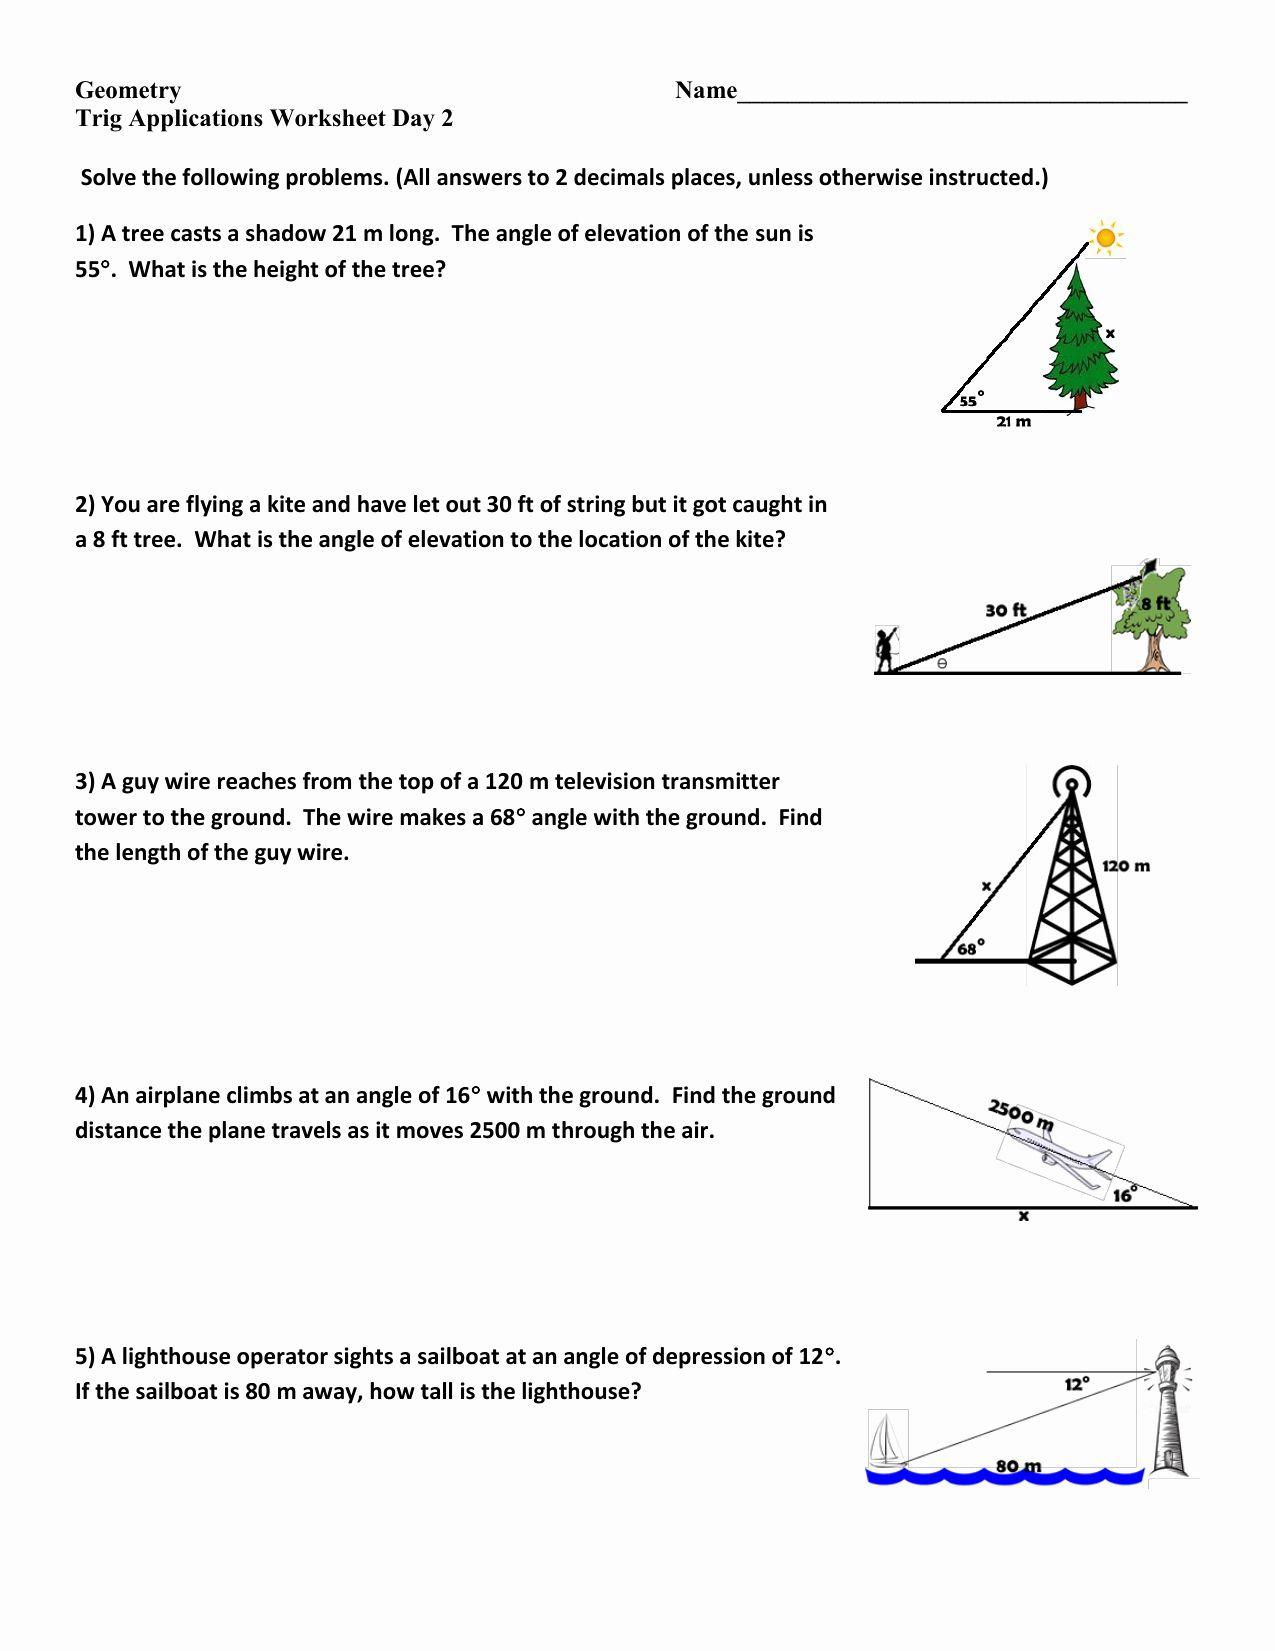 small resolution of Right Triangle Trigonometry Worksheet Luxury Trigonometry Word Problems  Worksheets with Answers   Trigonometry worksheets